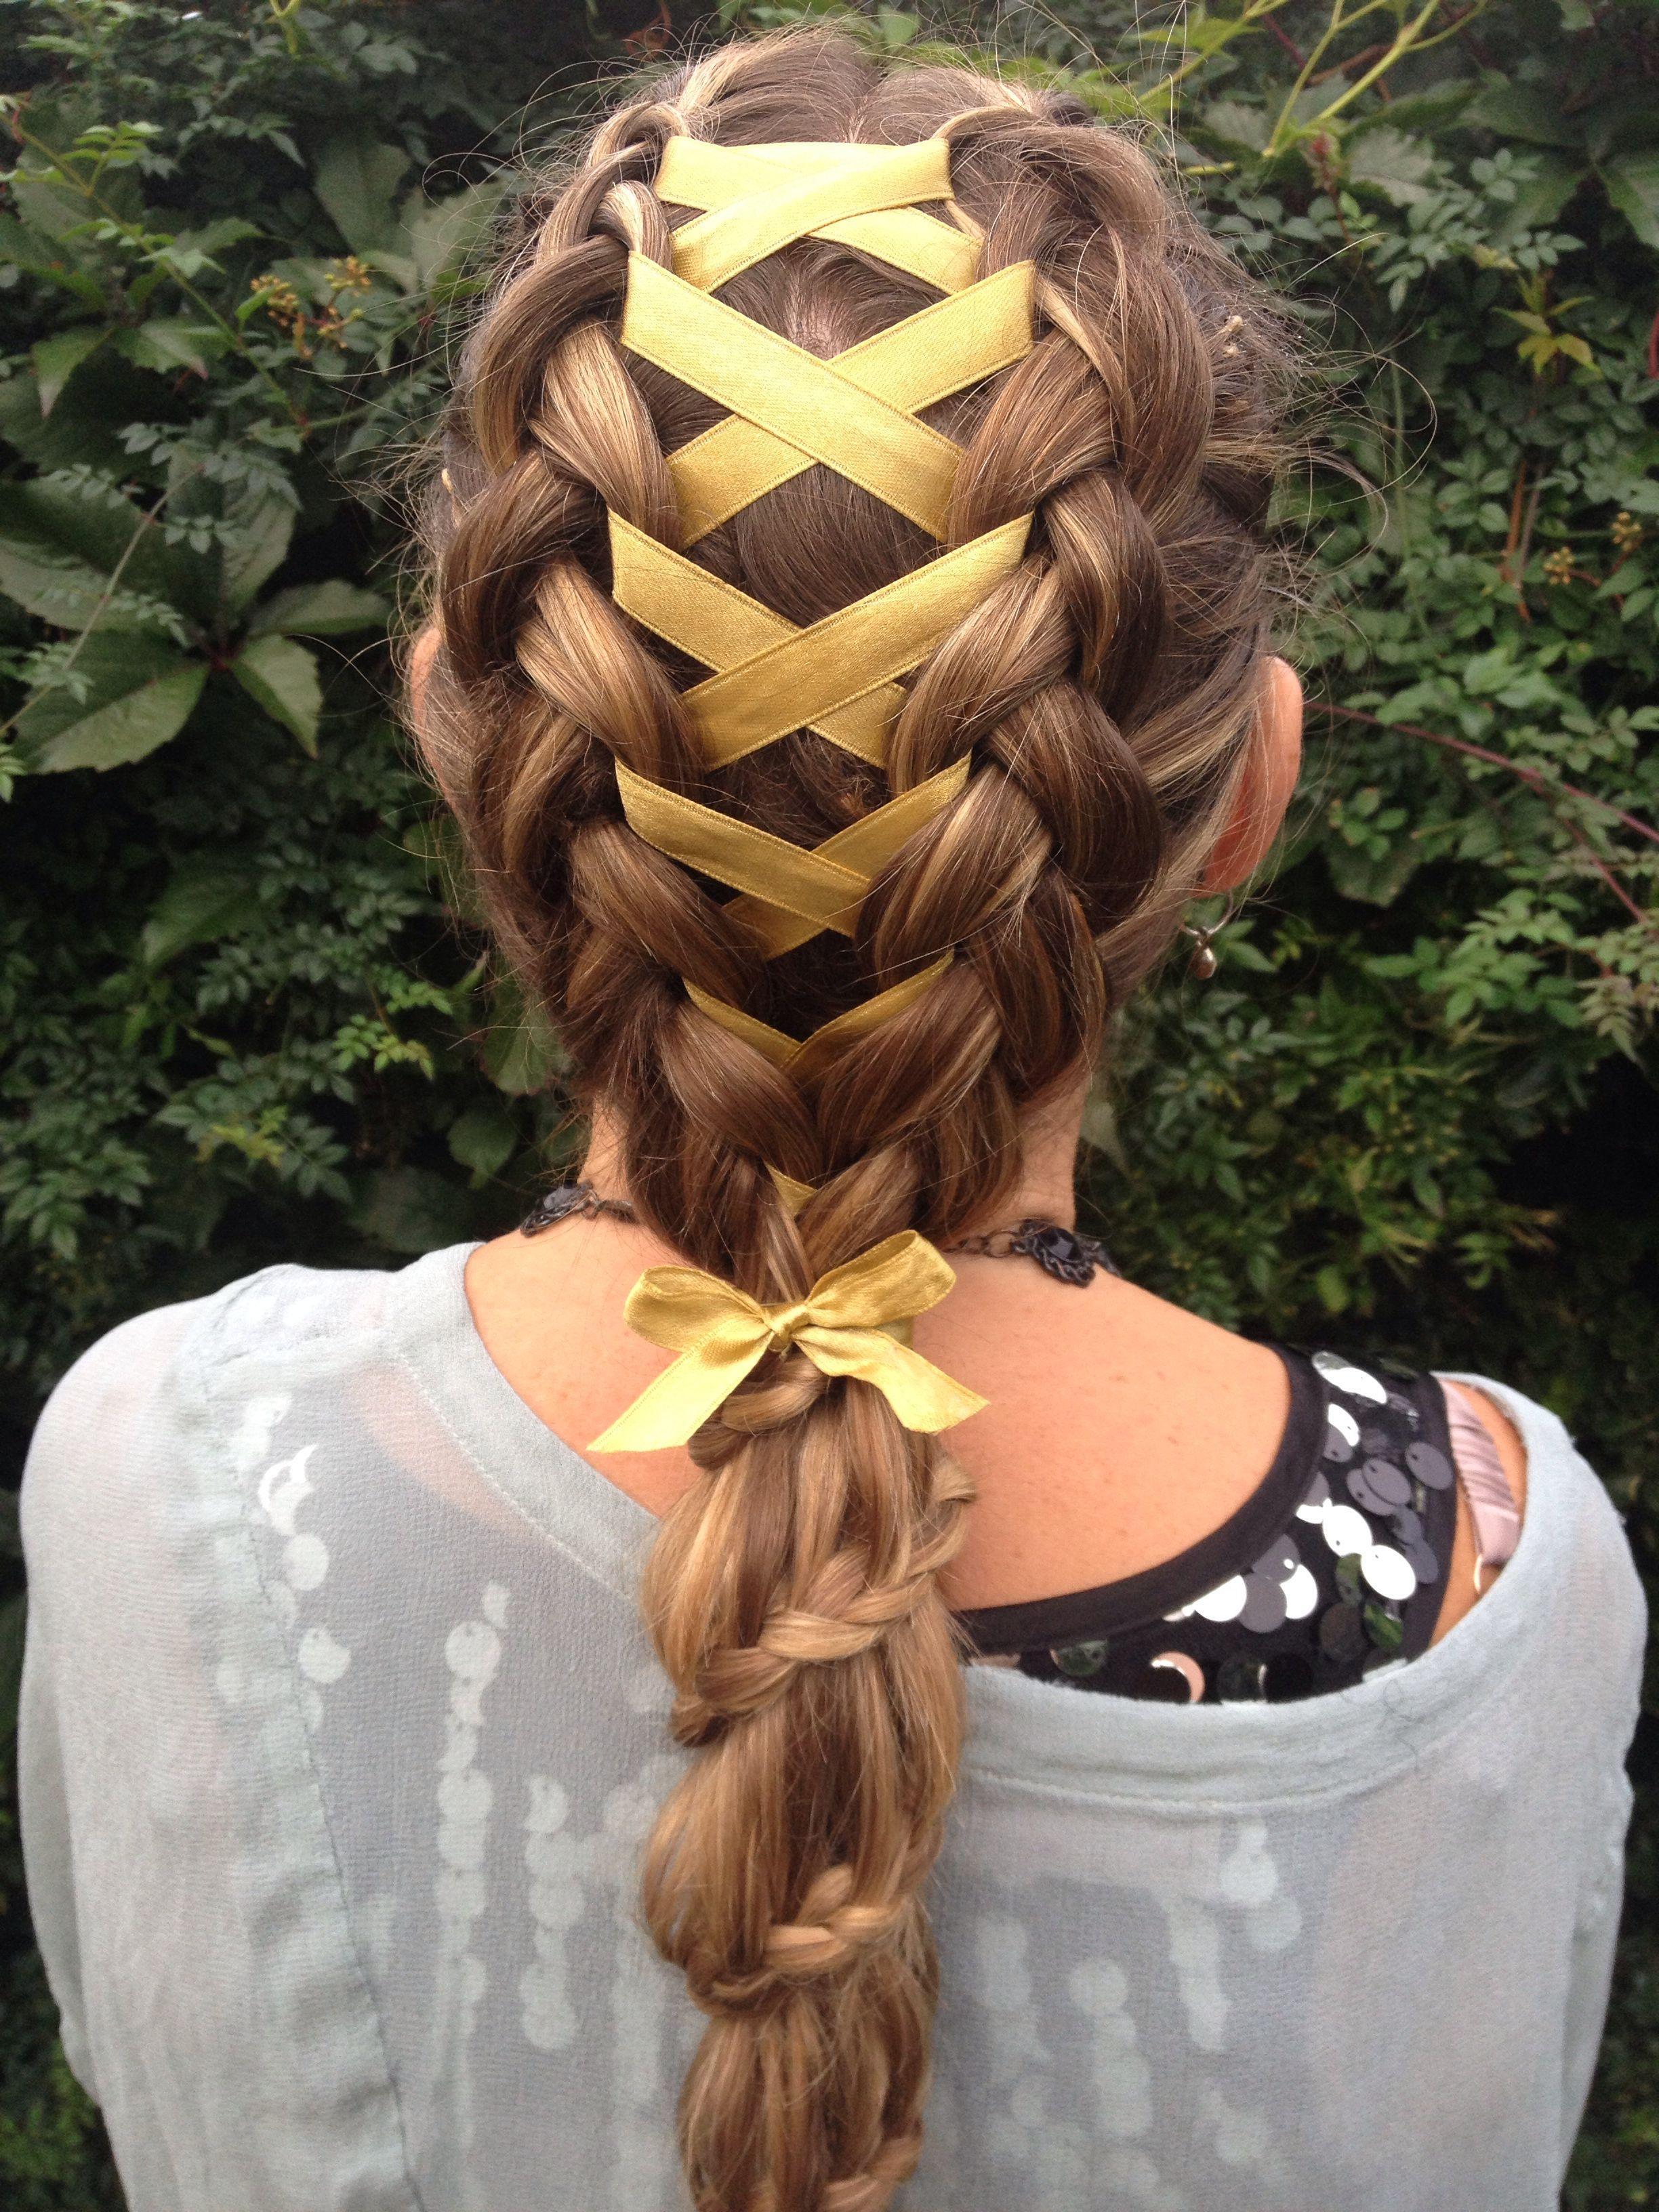 Corset Ribbon Braid Into A Carousel Braided Ponytail Hair Braids Hair Styles Ribbon Hairstyle Braided Hairstyles